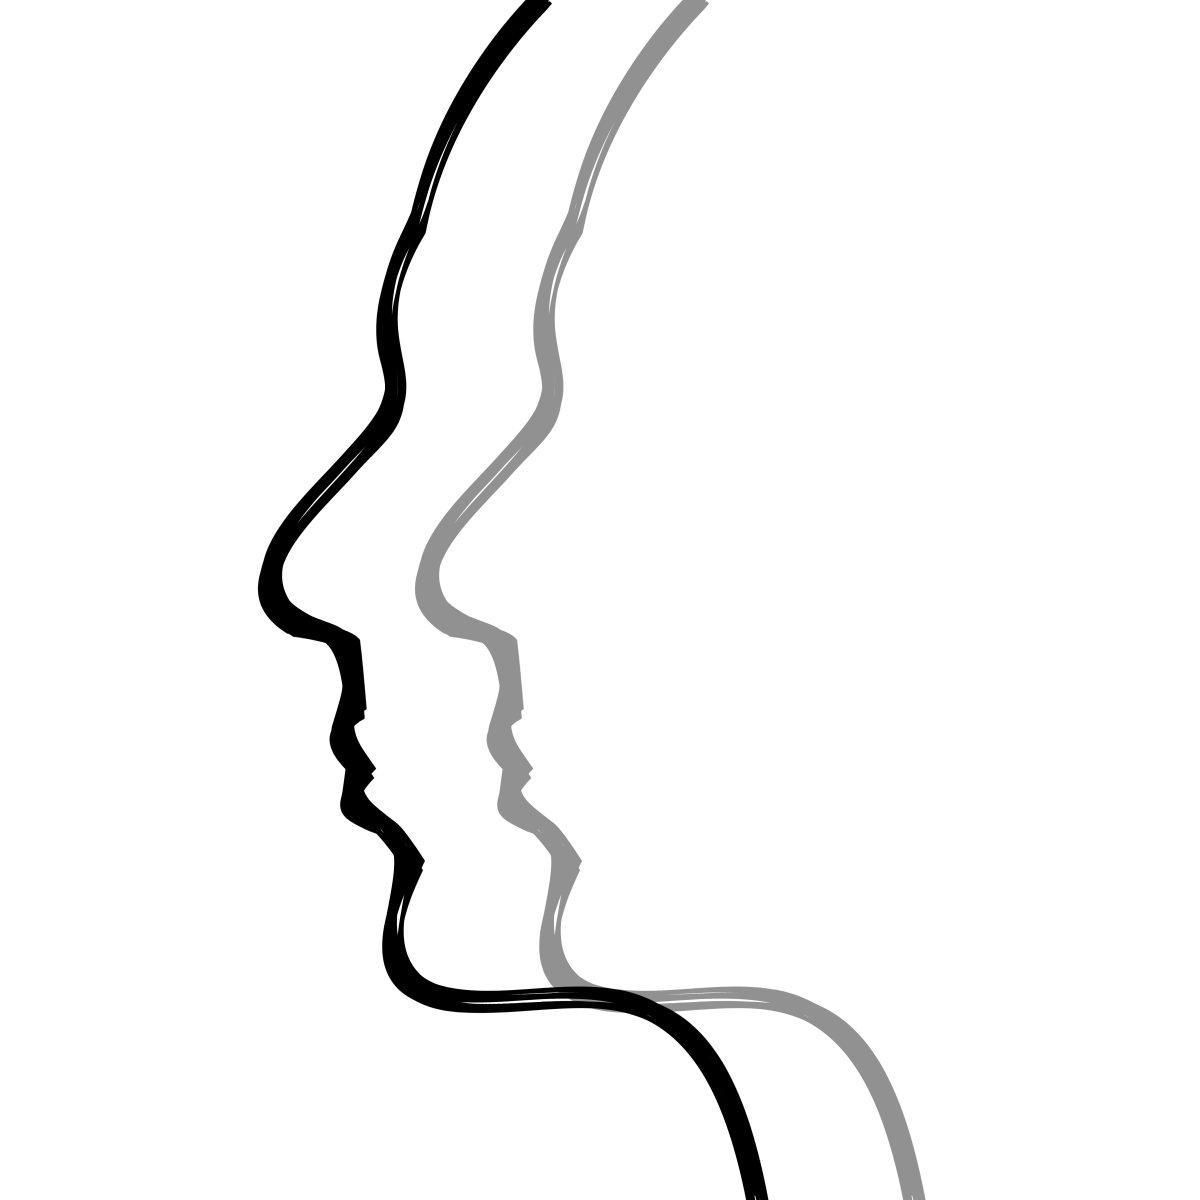 Drawn brain human body #6